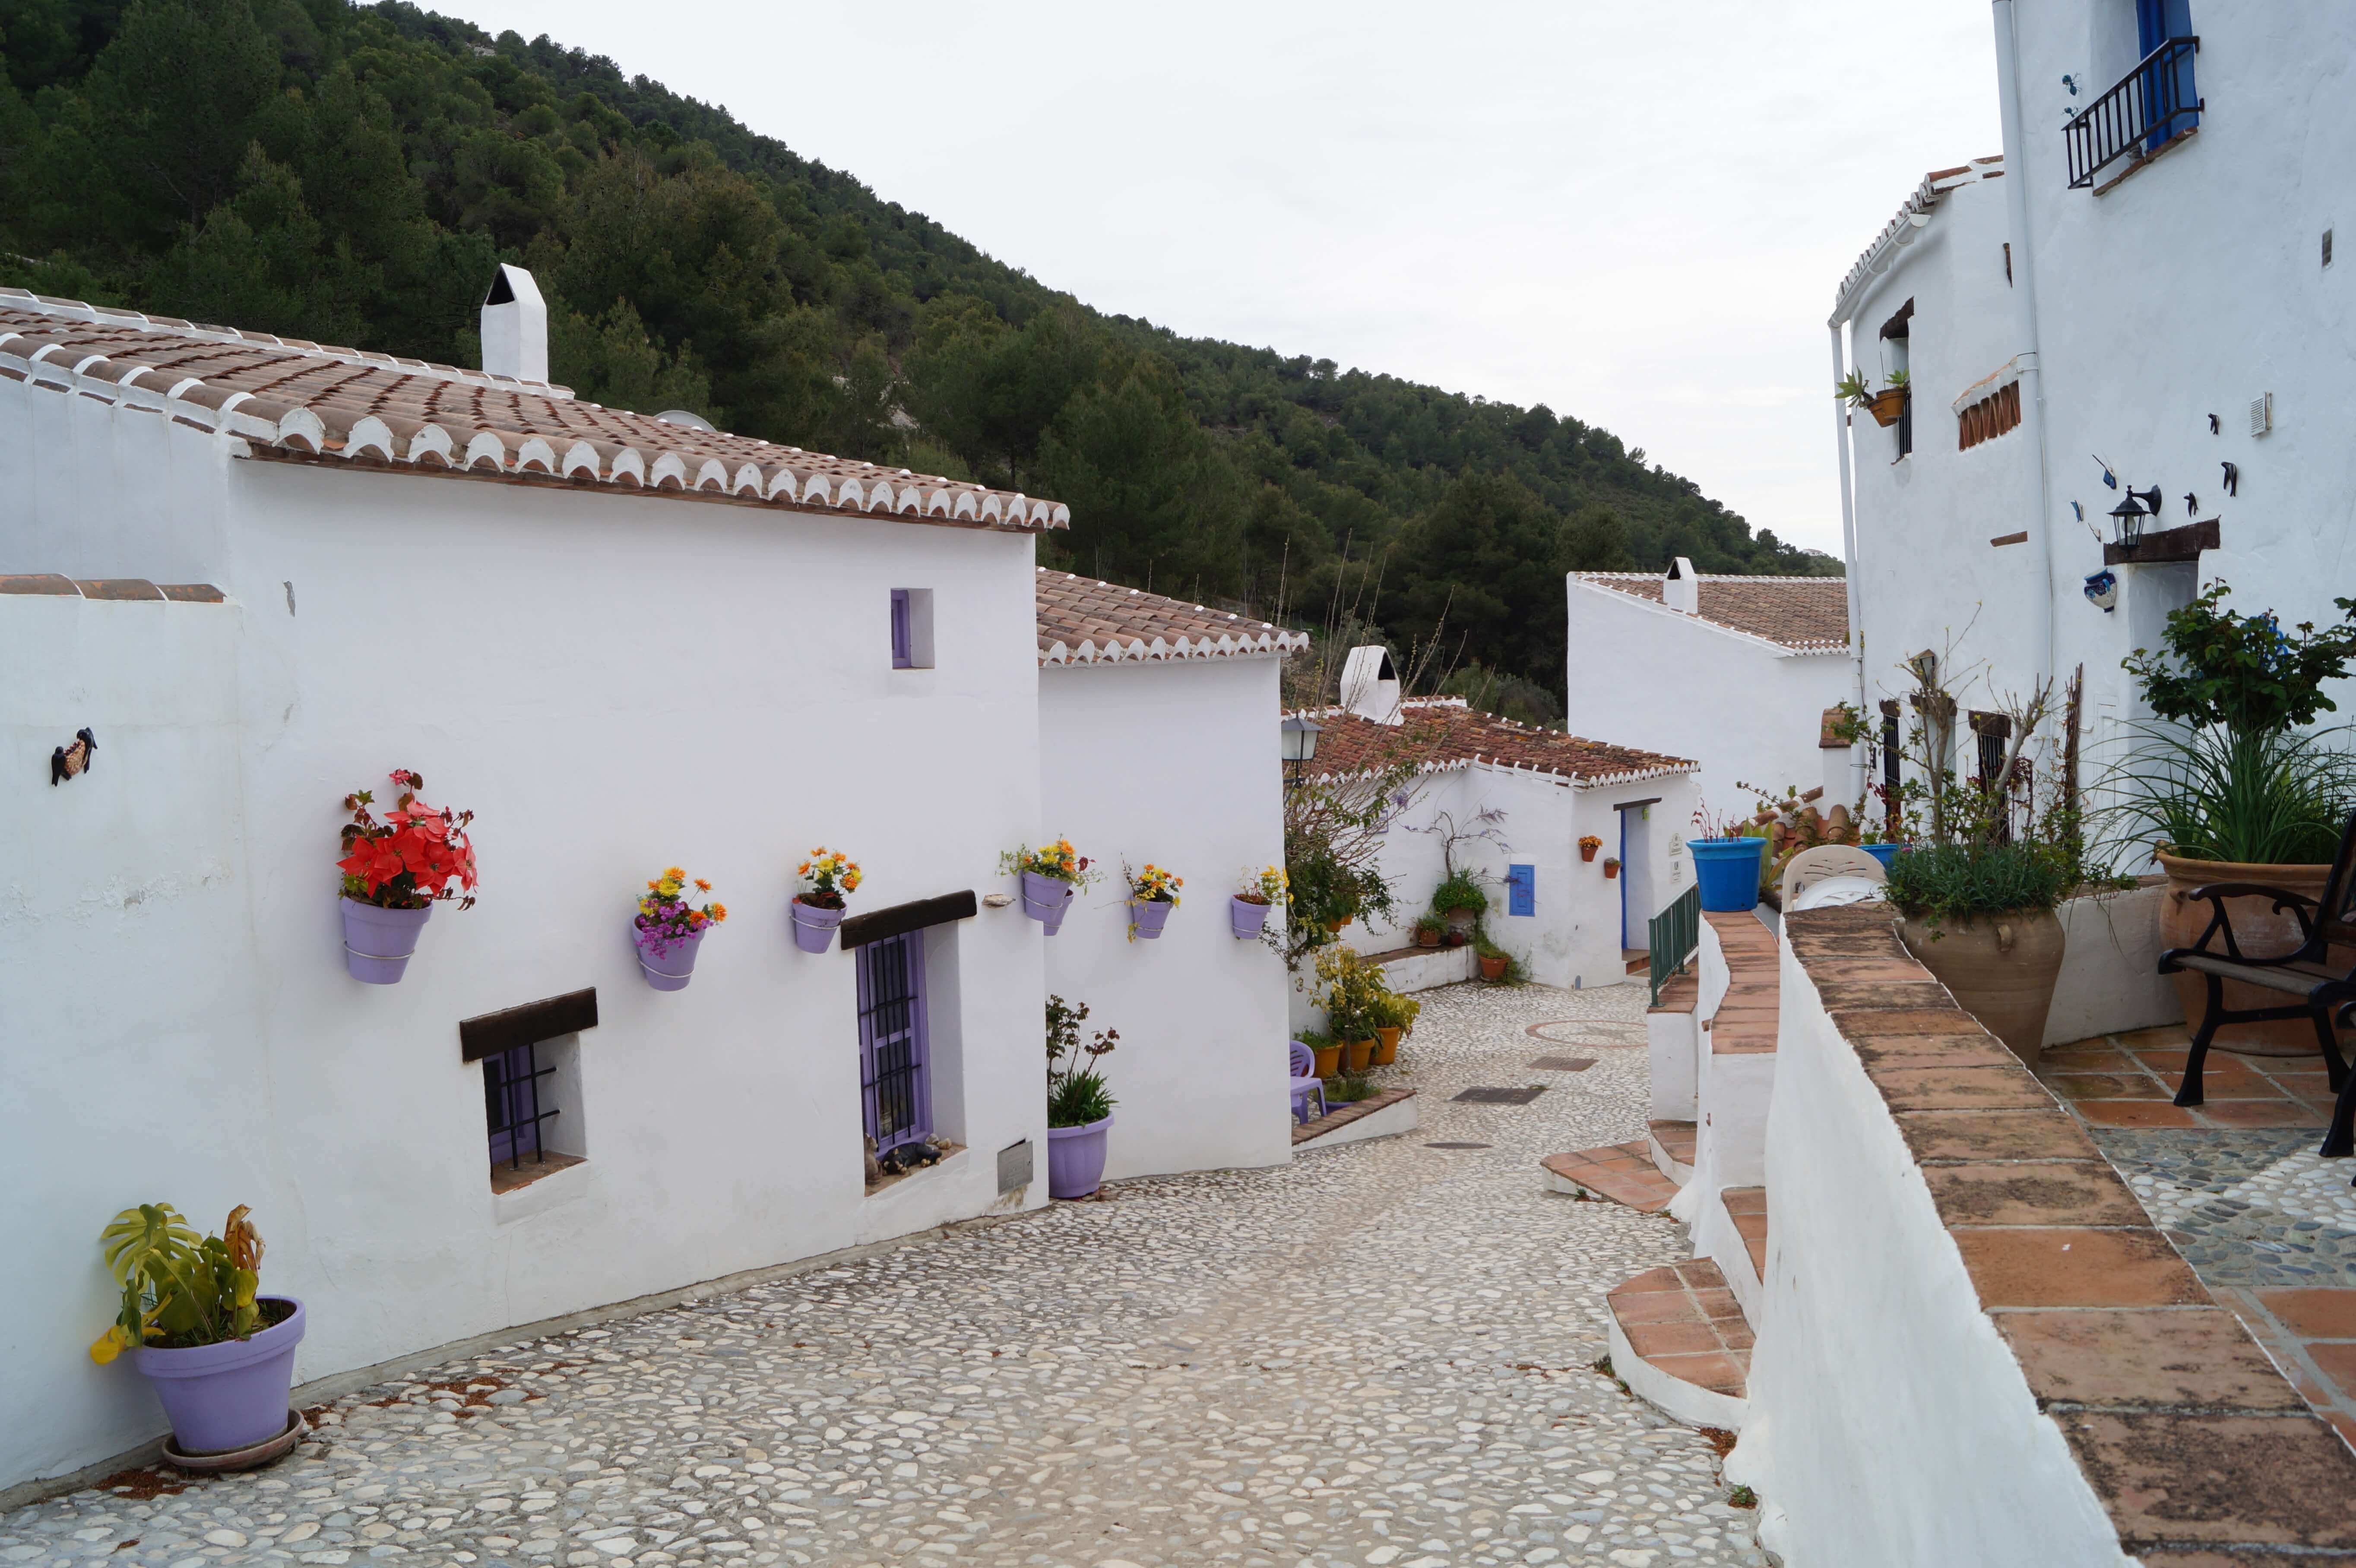 Andalusien, Spanien, Ausflugstipp, Bergdorf